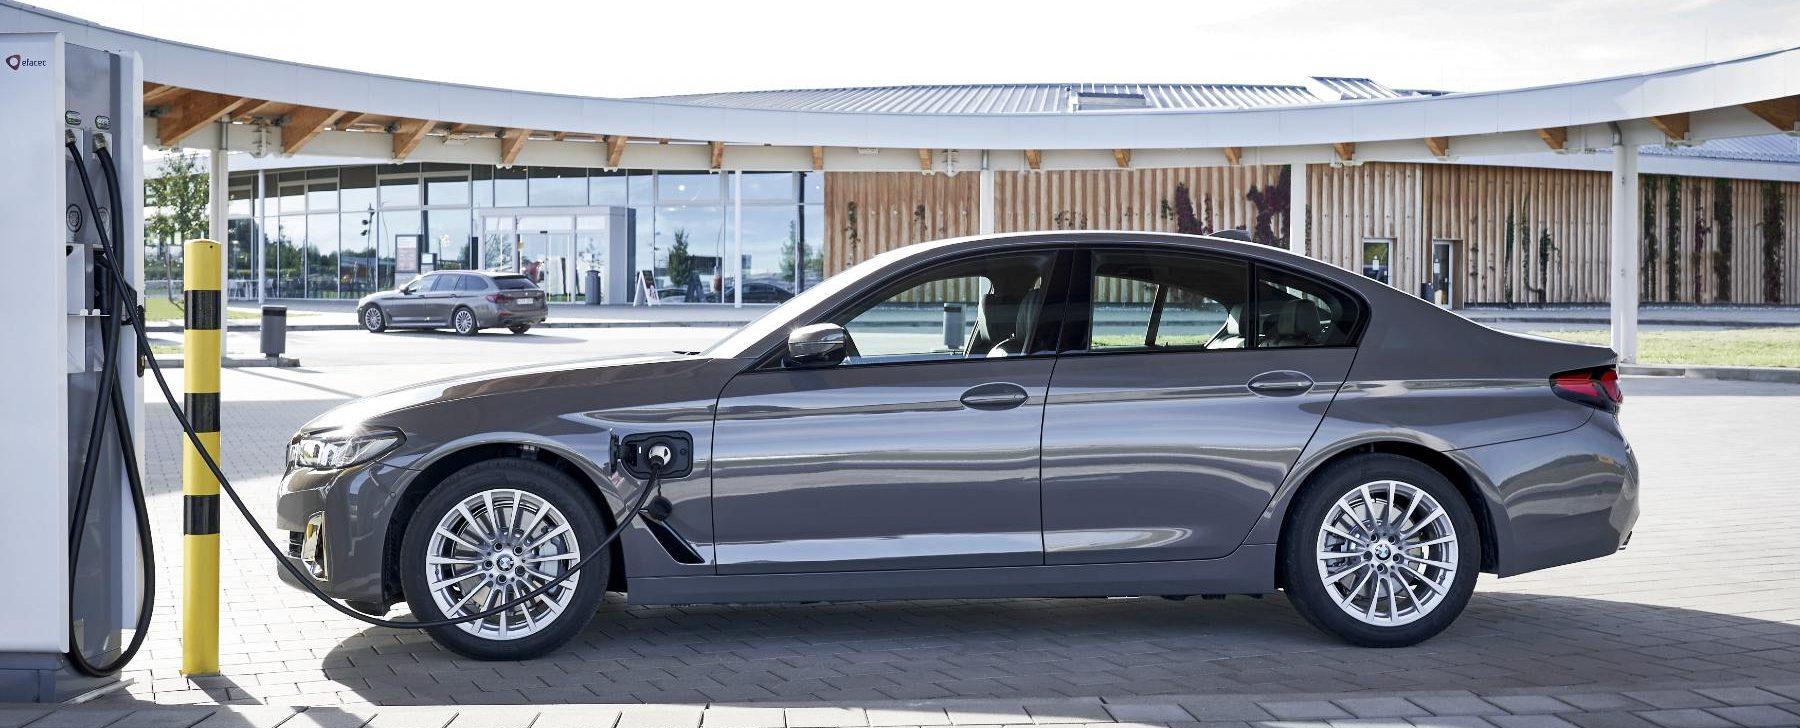 BMW hibridos enchufables